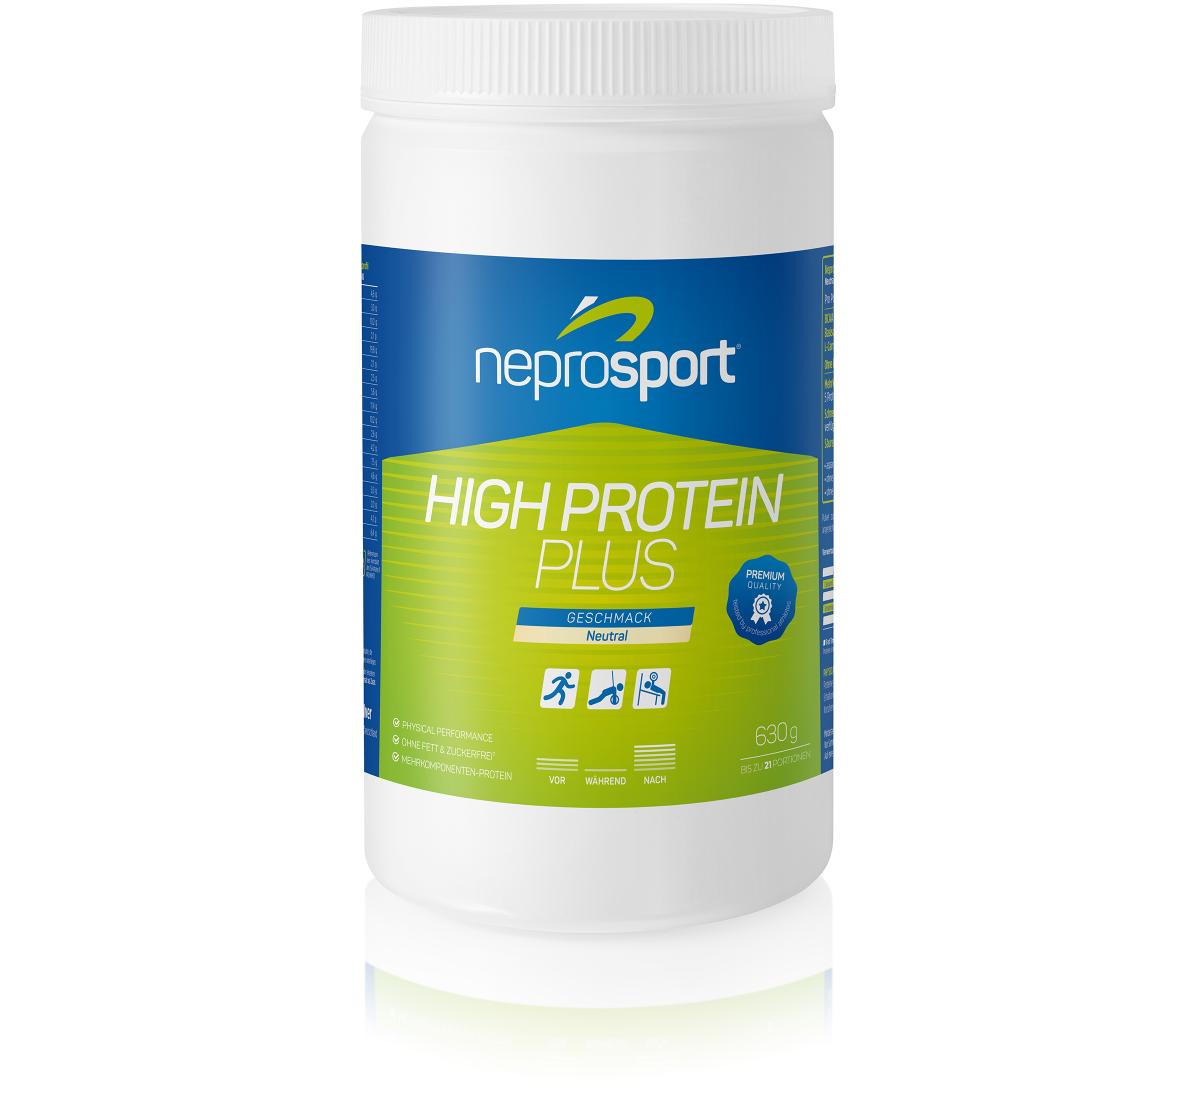 High Protein Plus